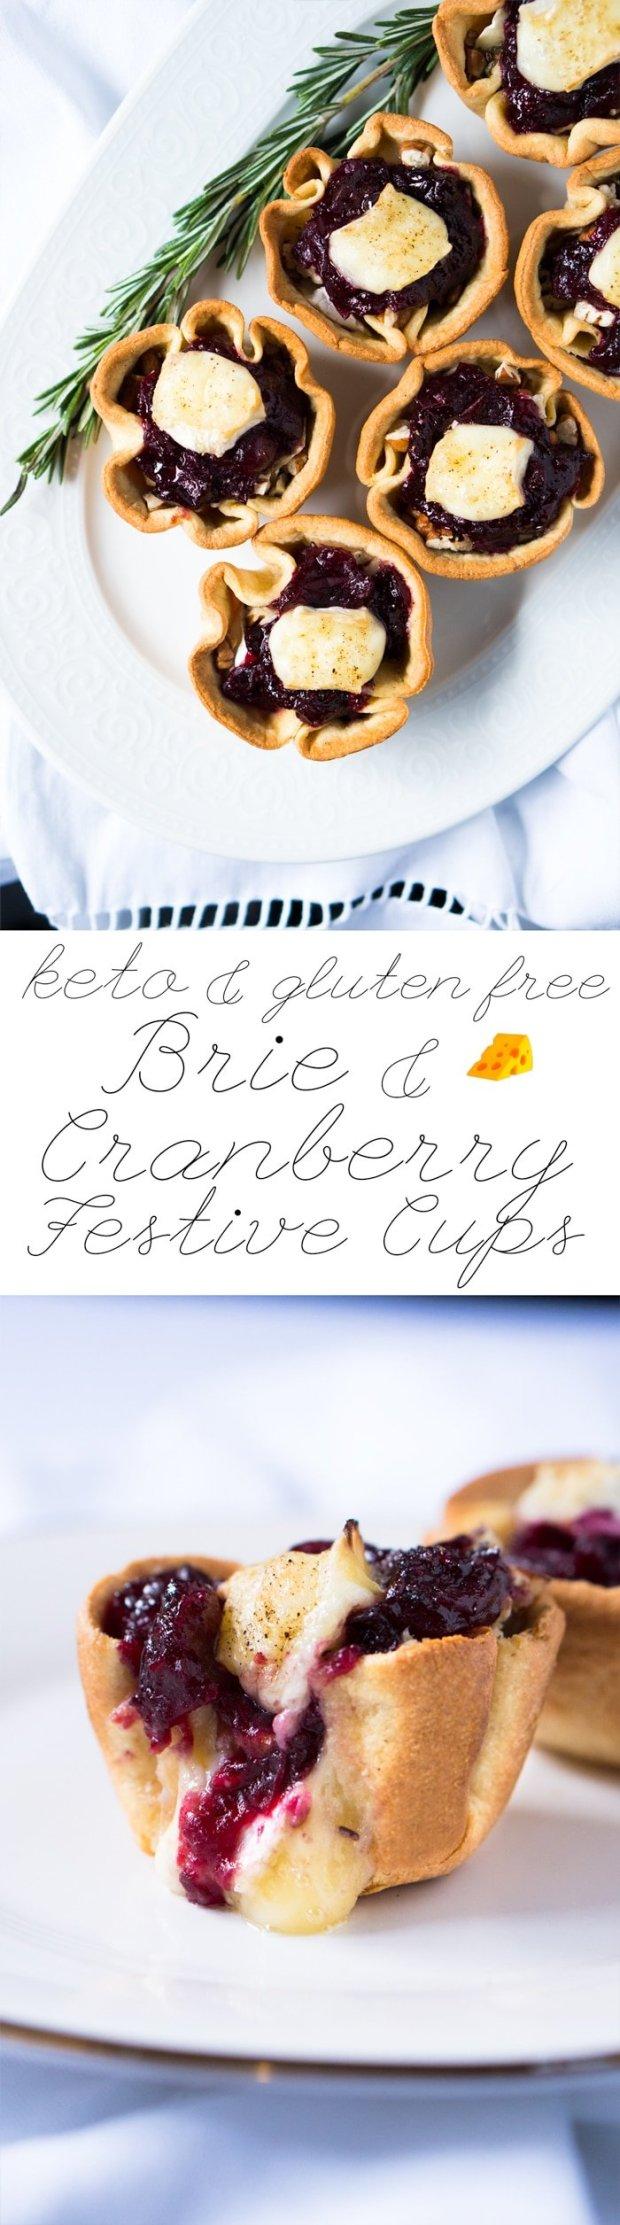 Keto Brie Cranberry Festive Cups 🎄 3g net carbs #keto #ketobrie